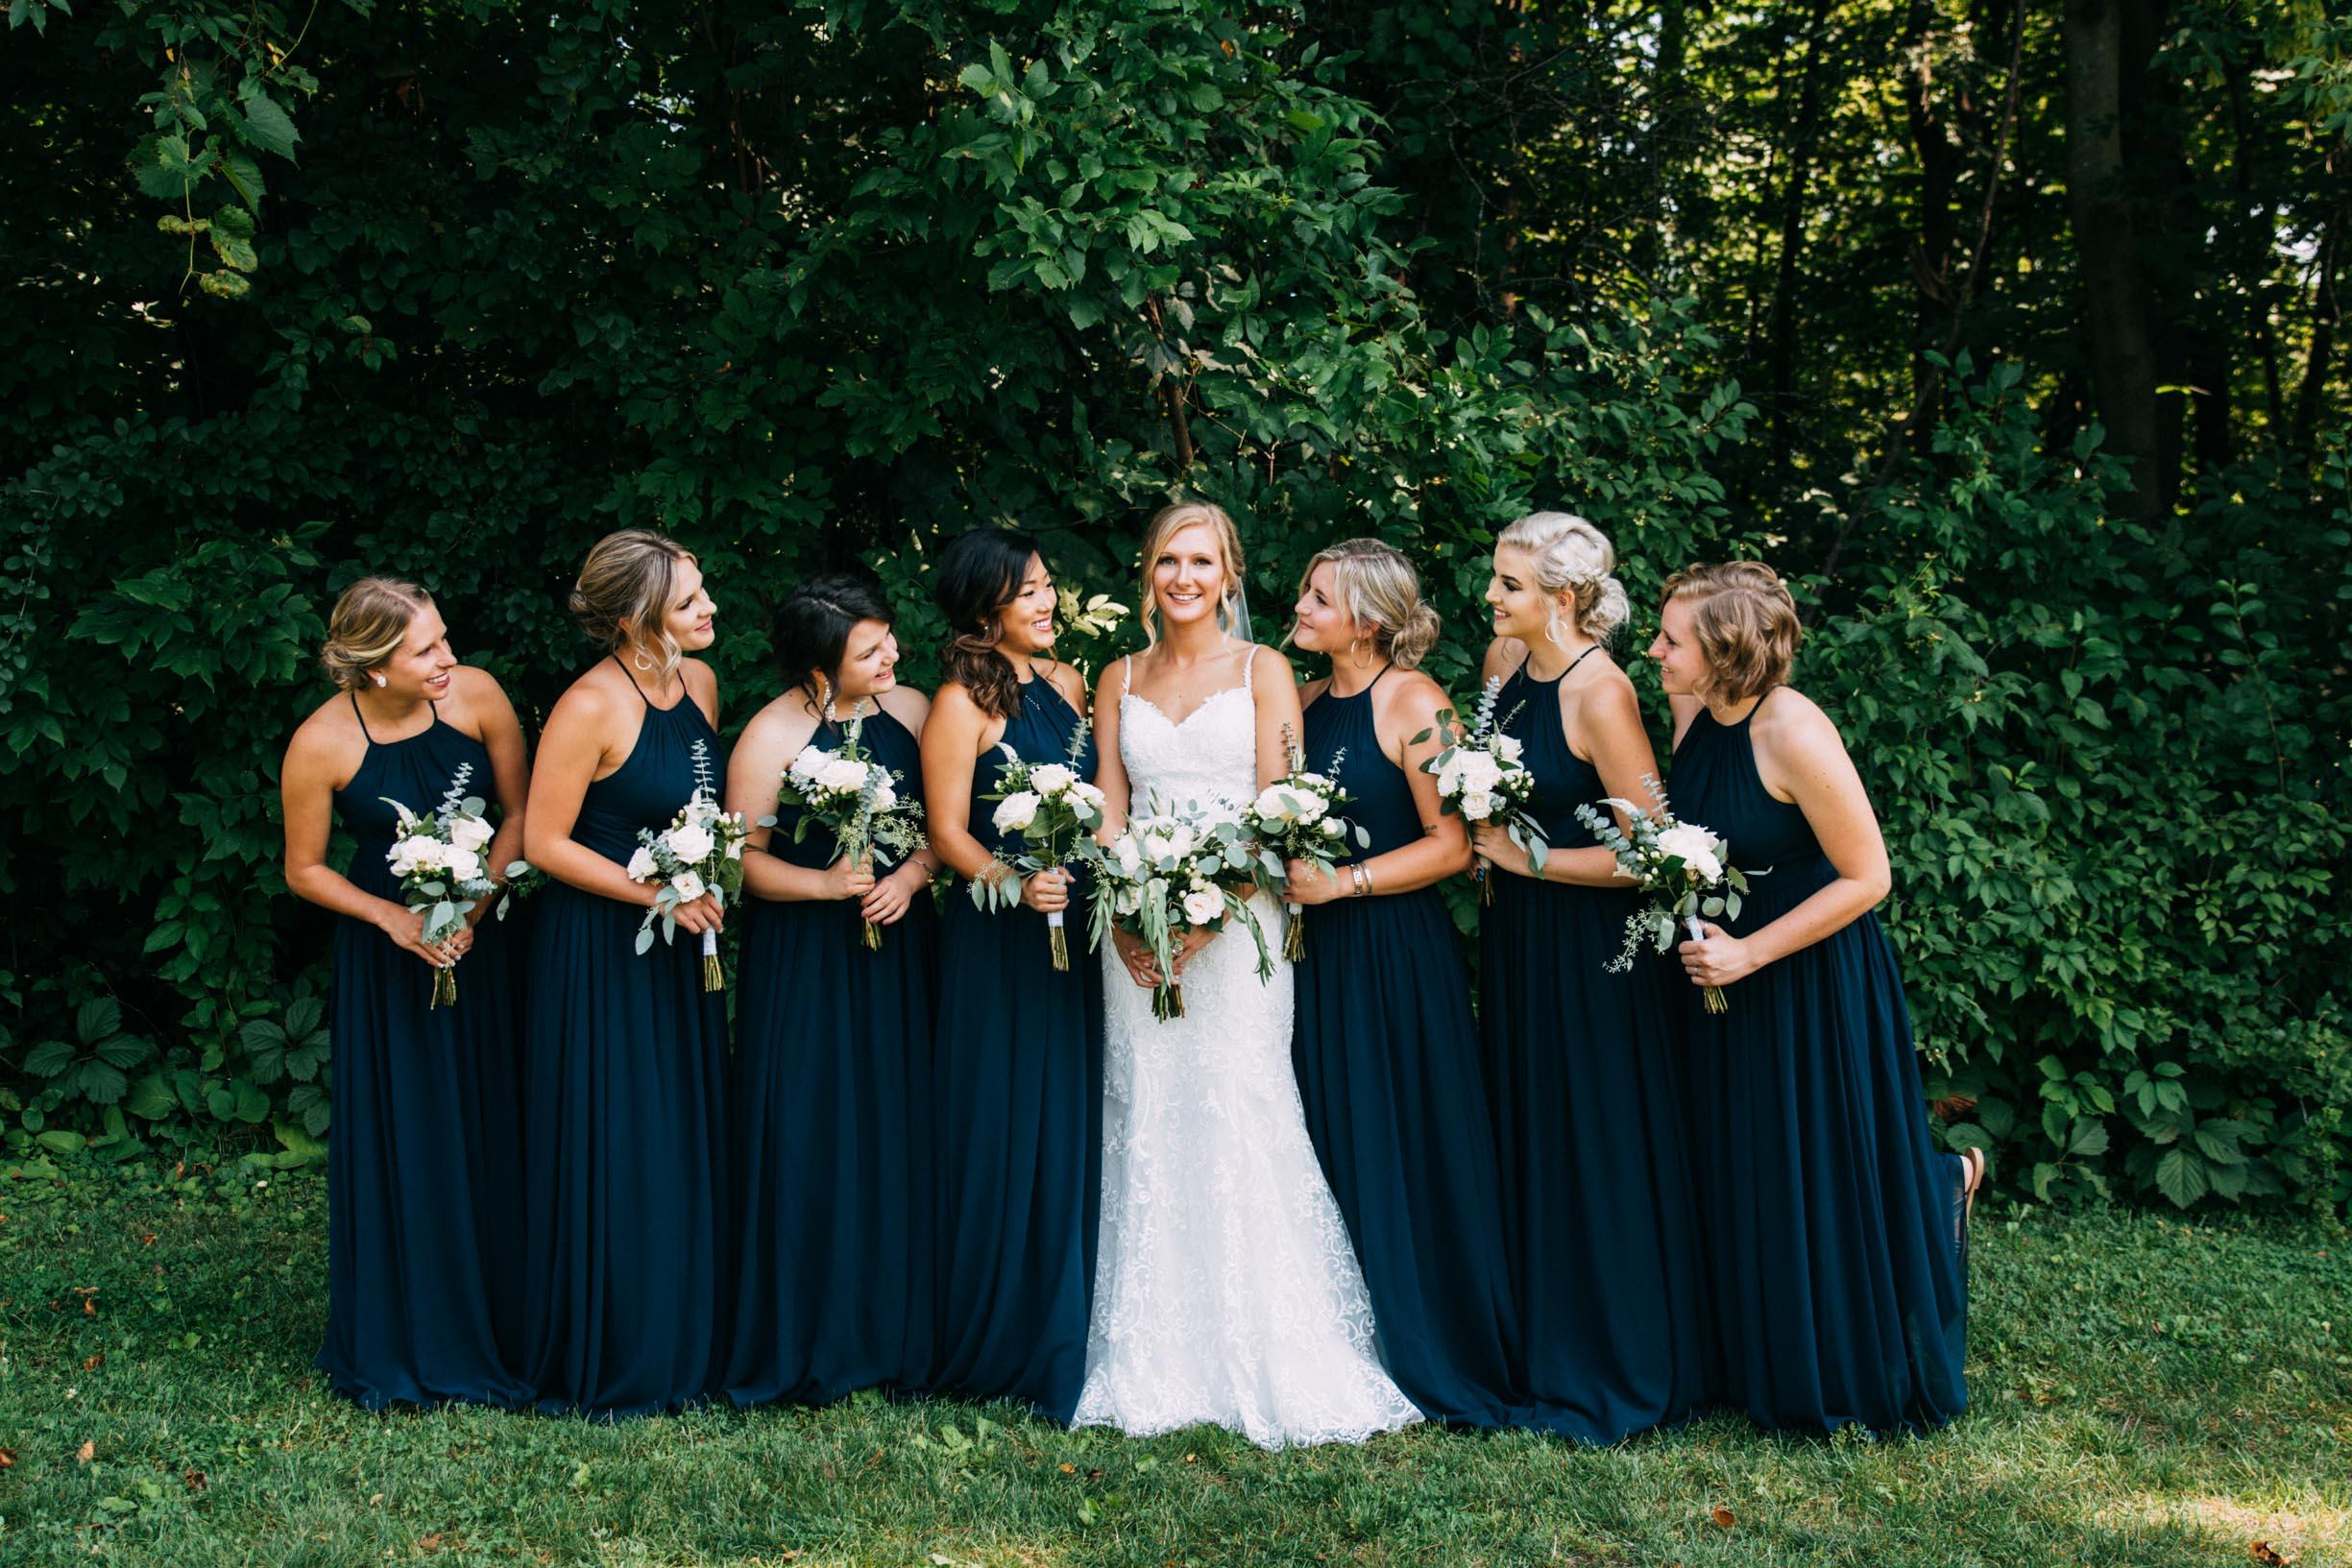 12-Minnetonka Orchards Wedding Ashley Bryce Blog.jpg